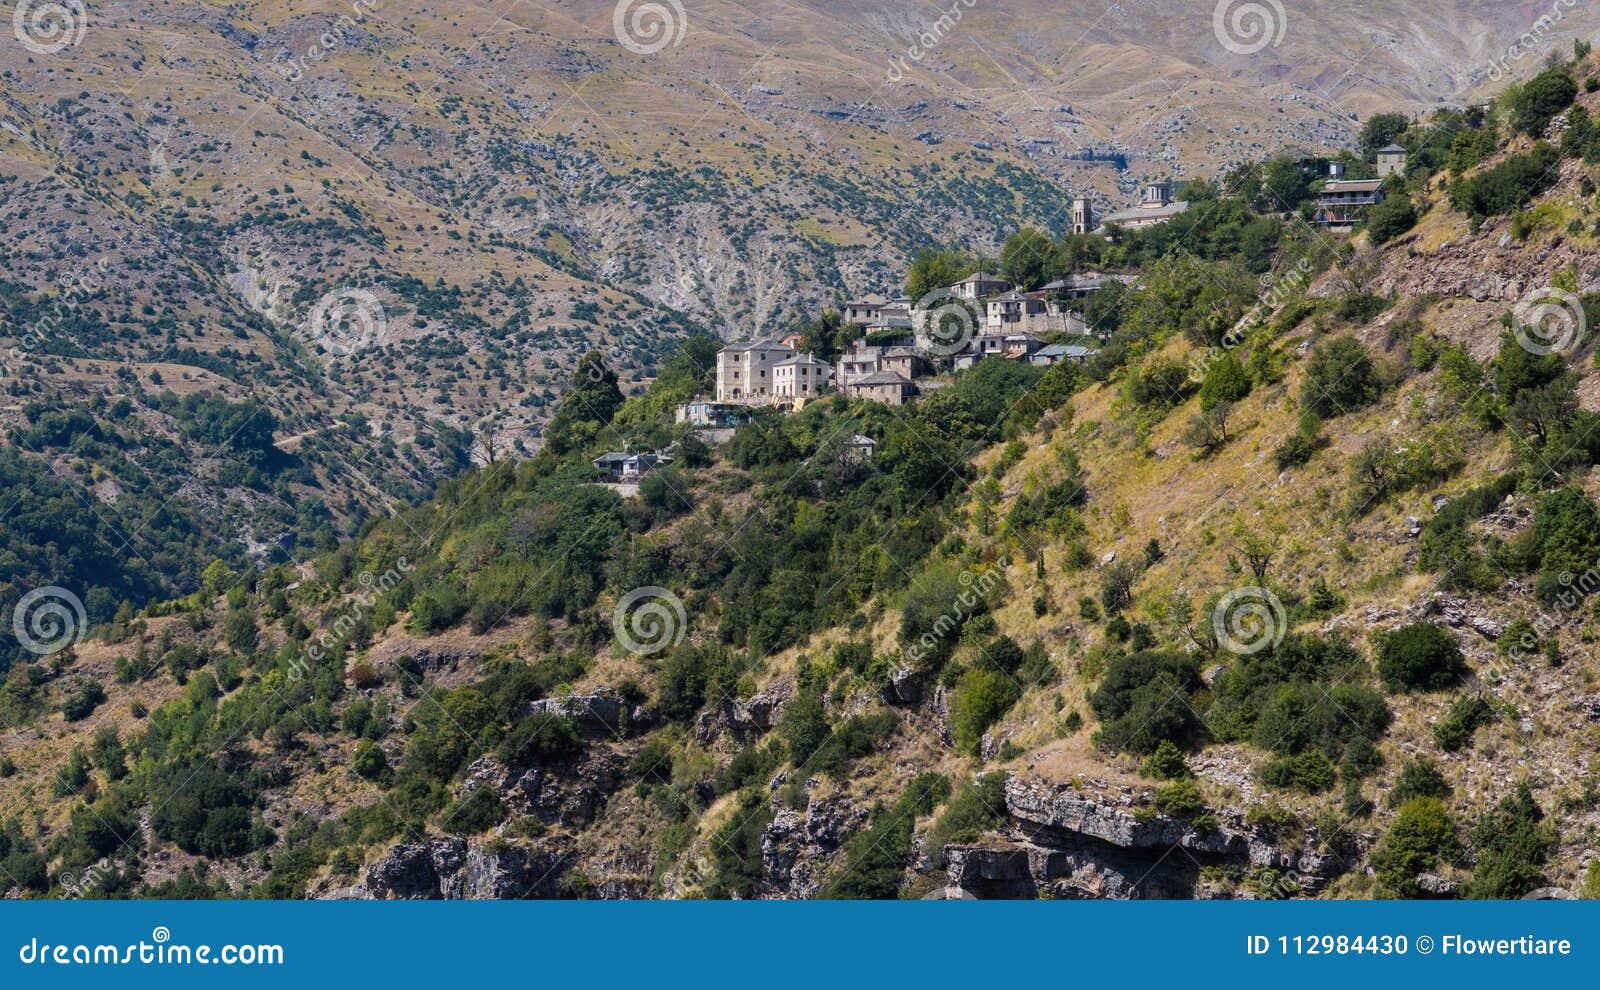 Village in the mountain in National Park of Tzoumerka, Greece Epirus region. Mountain in the clouds